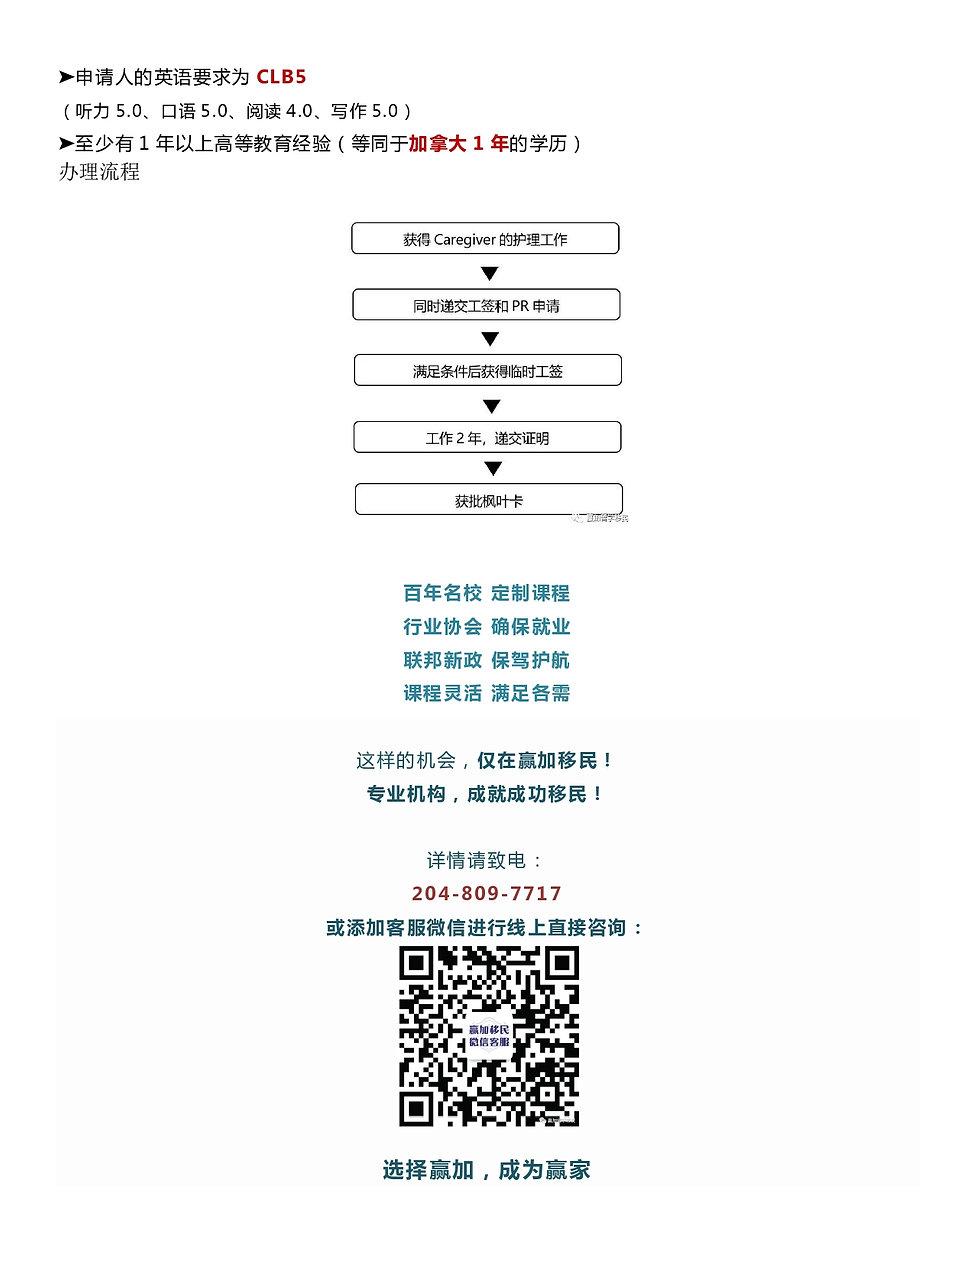 护理班_page-0008.jpg